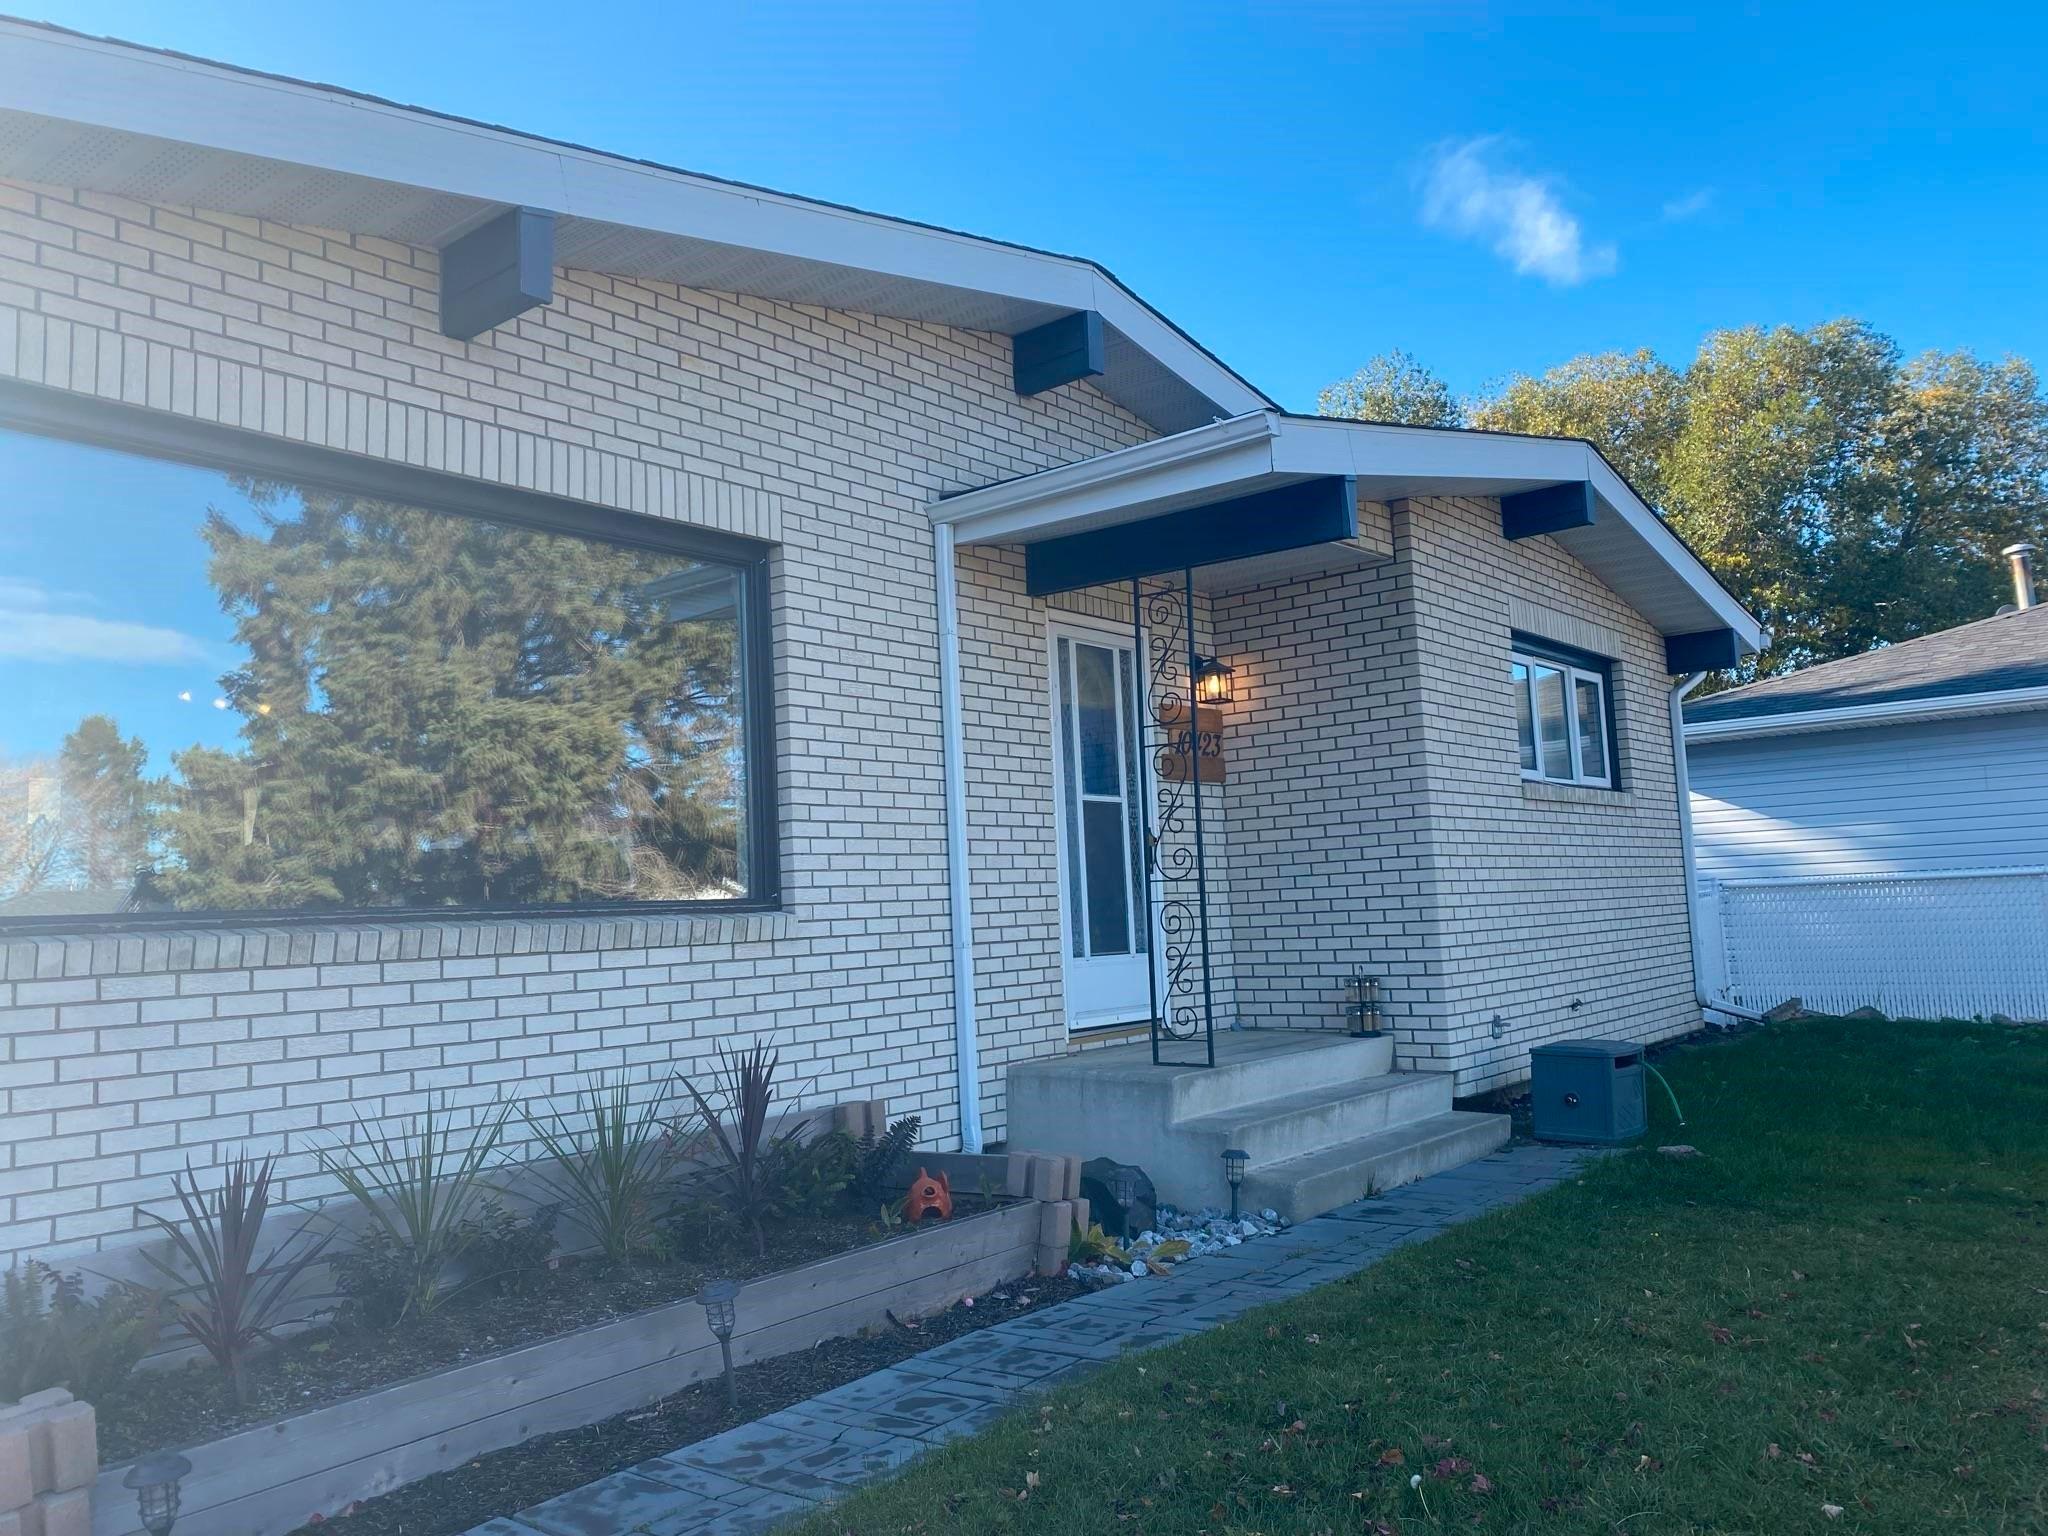 Main Photo: 10423 35A Avenue in Edmonton: Zone 16 House for sale : MLS®# E4266240